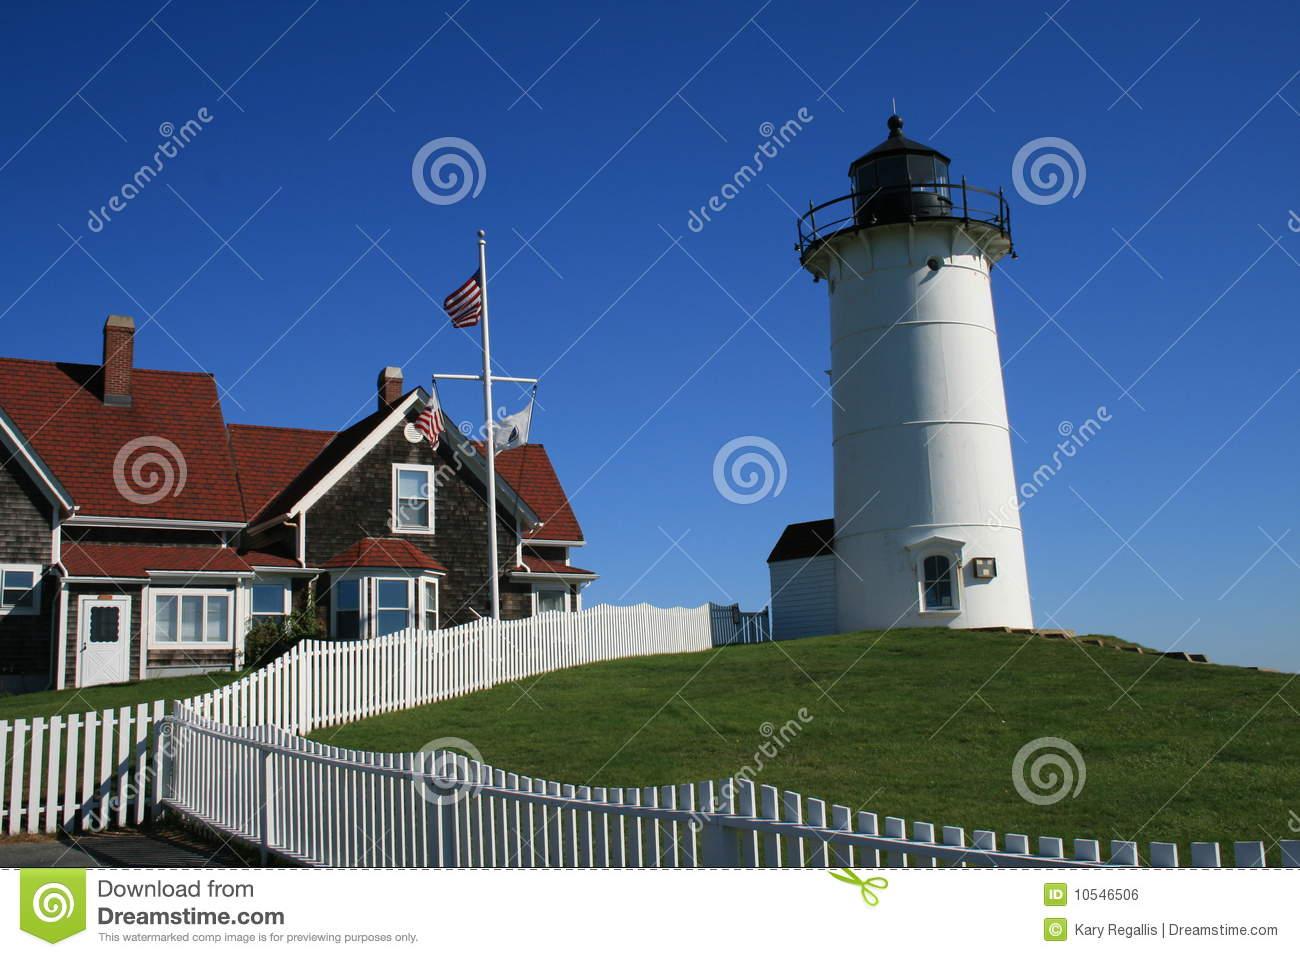 Cape Cod Clipart Clipart Suggest